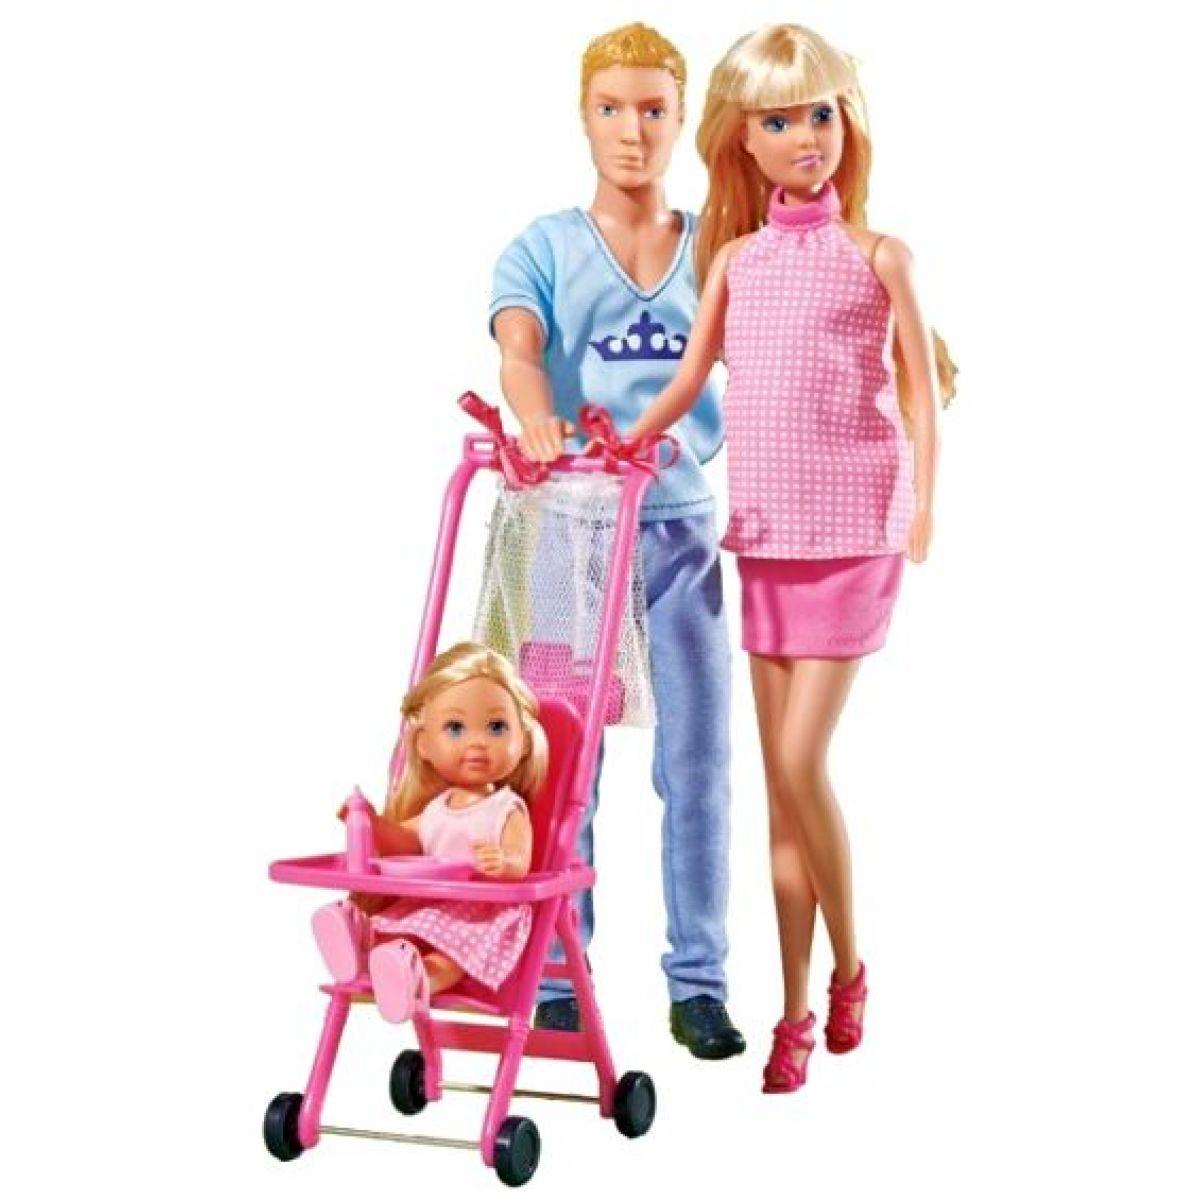 Steffi Love Šťastná rodina těhotná panenka a Kevin